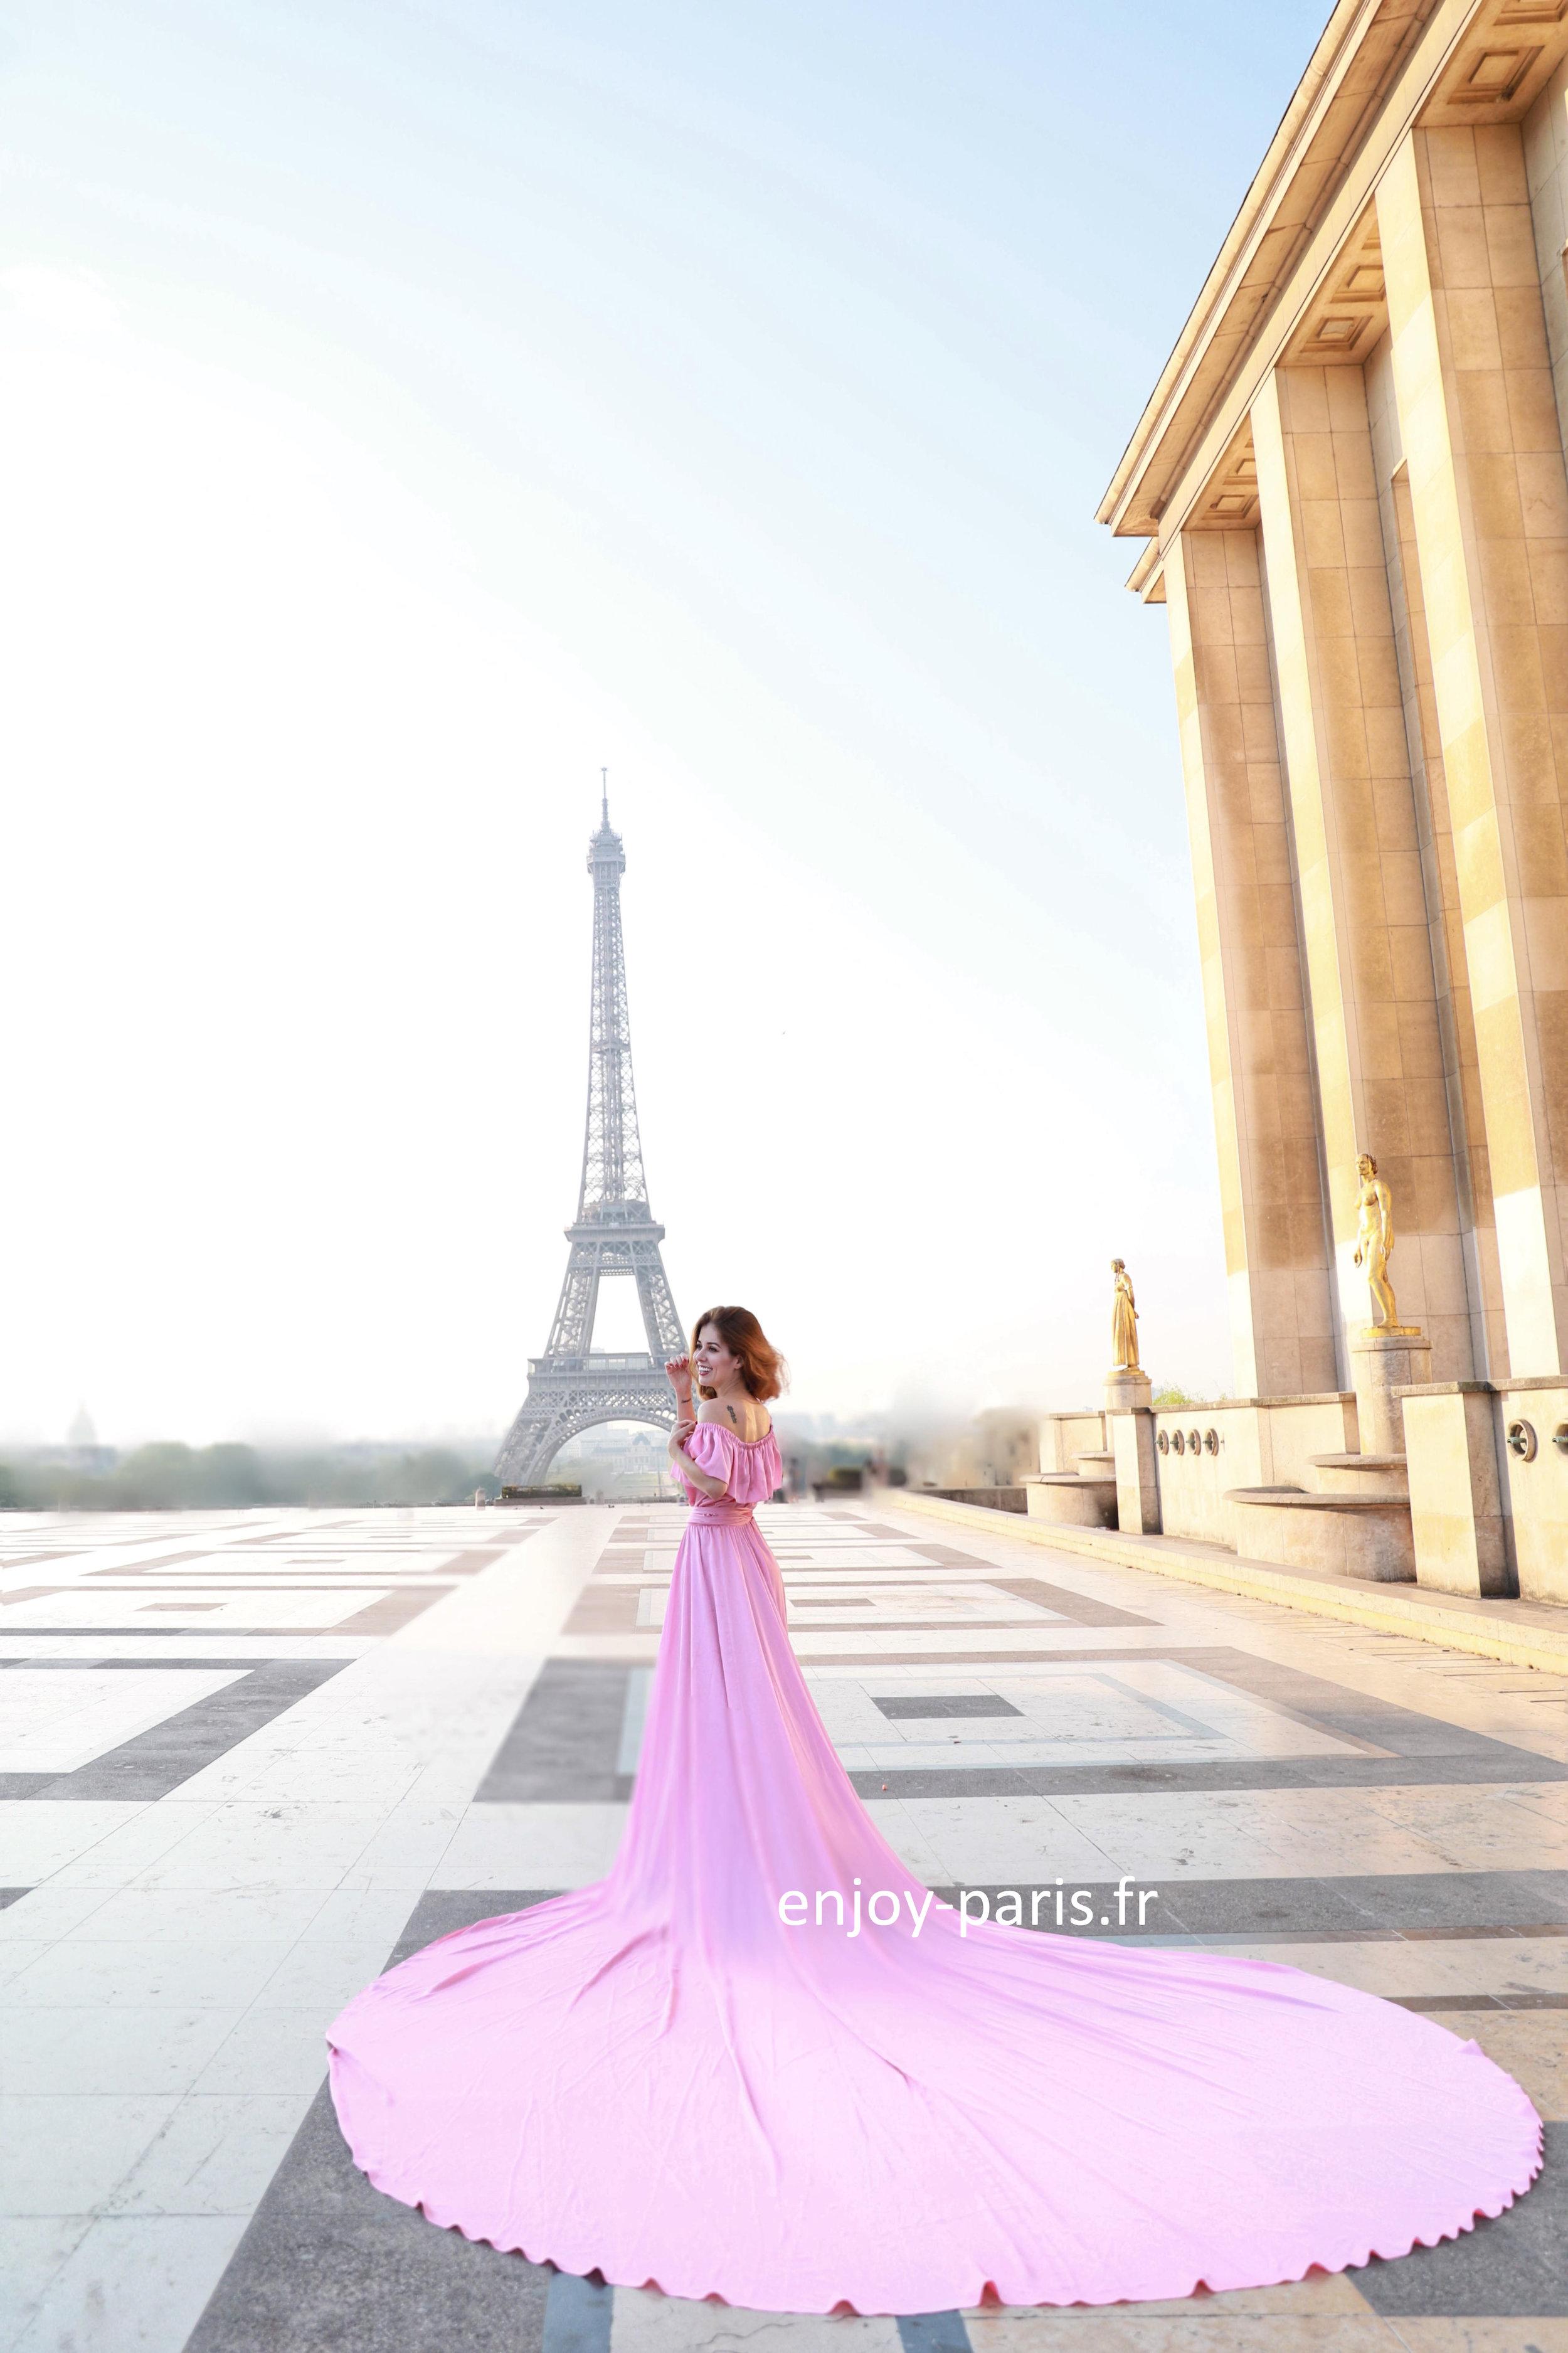 1_pink_dress.jpg